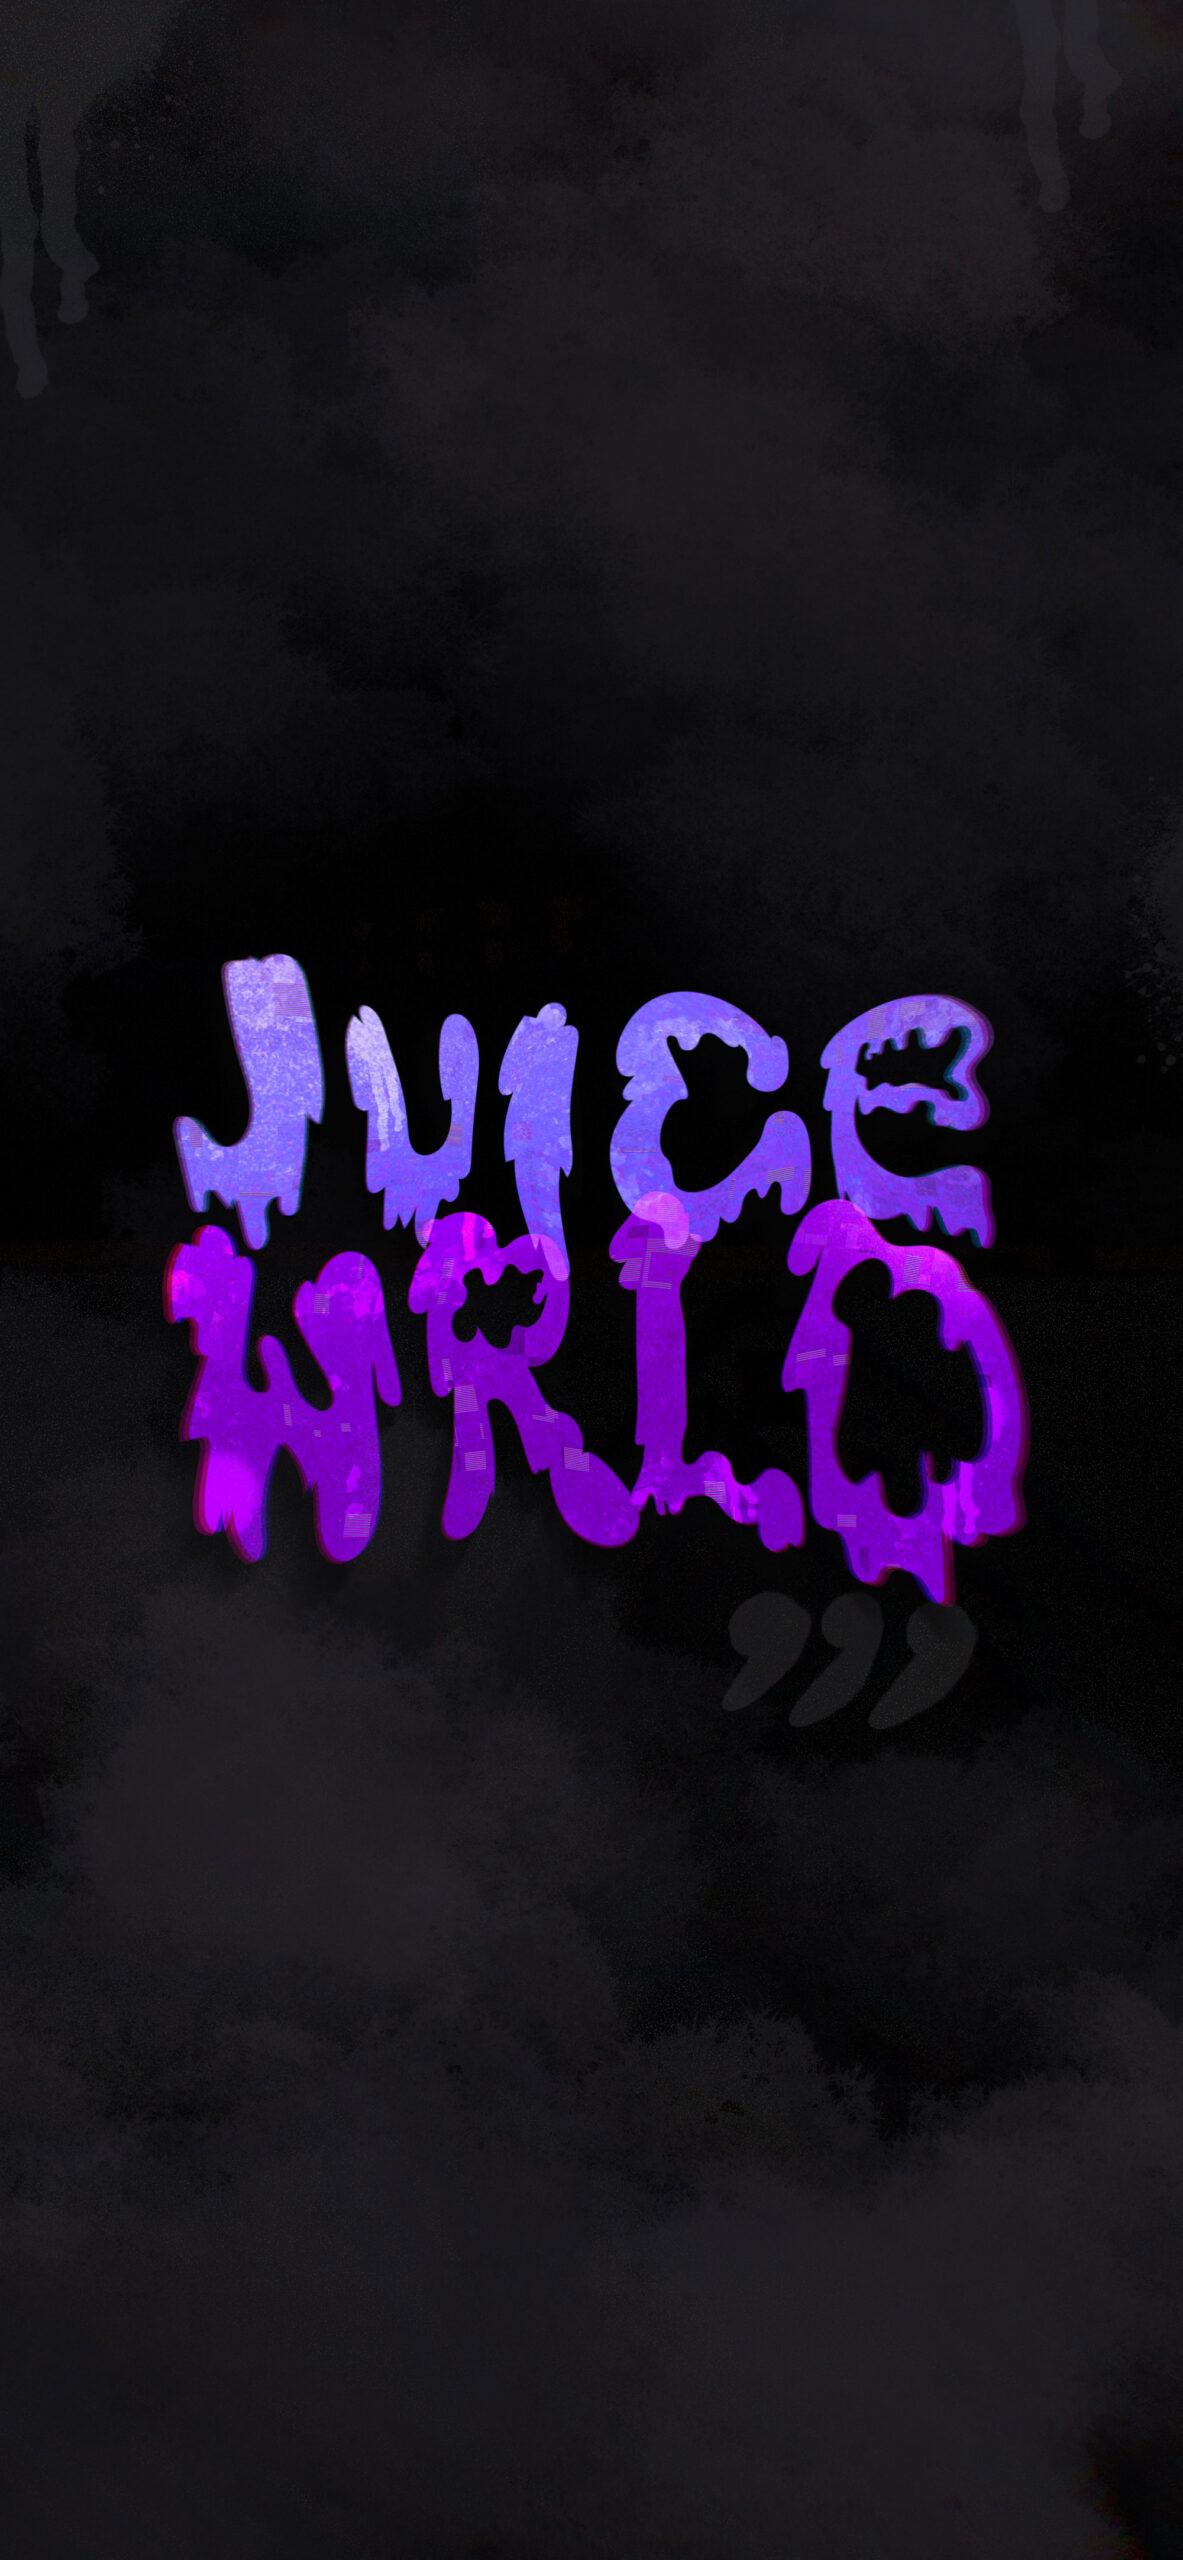 juice wrld tag black wallpaper